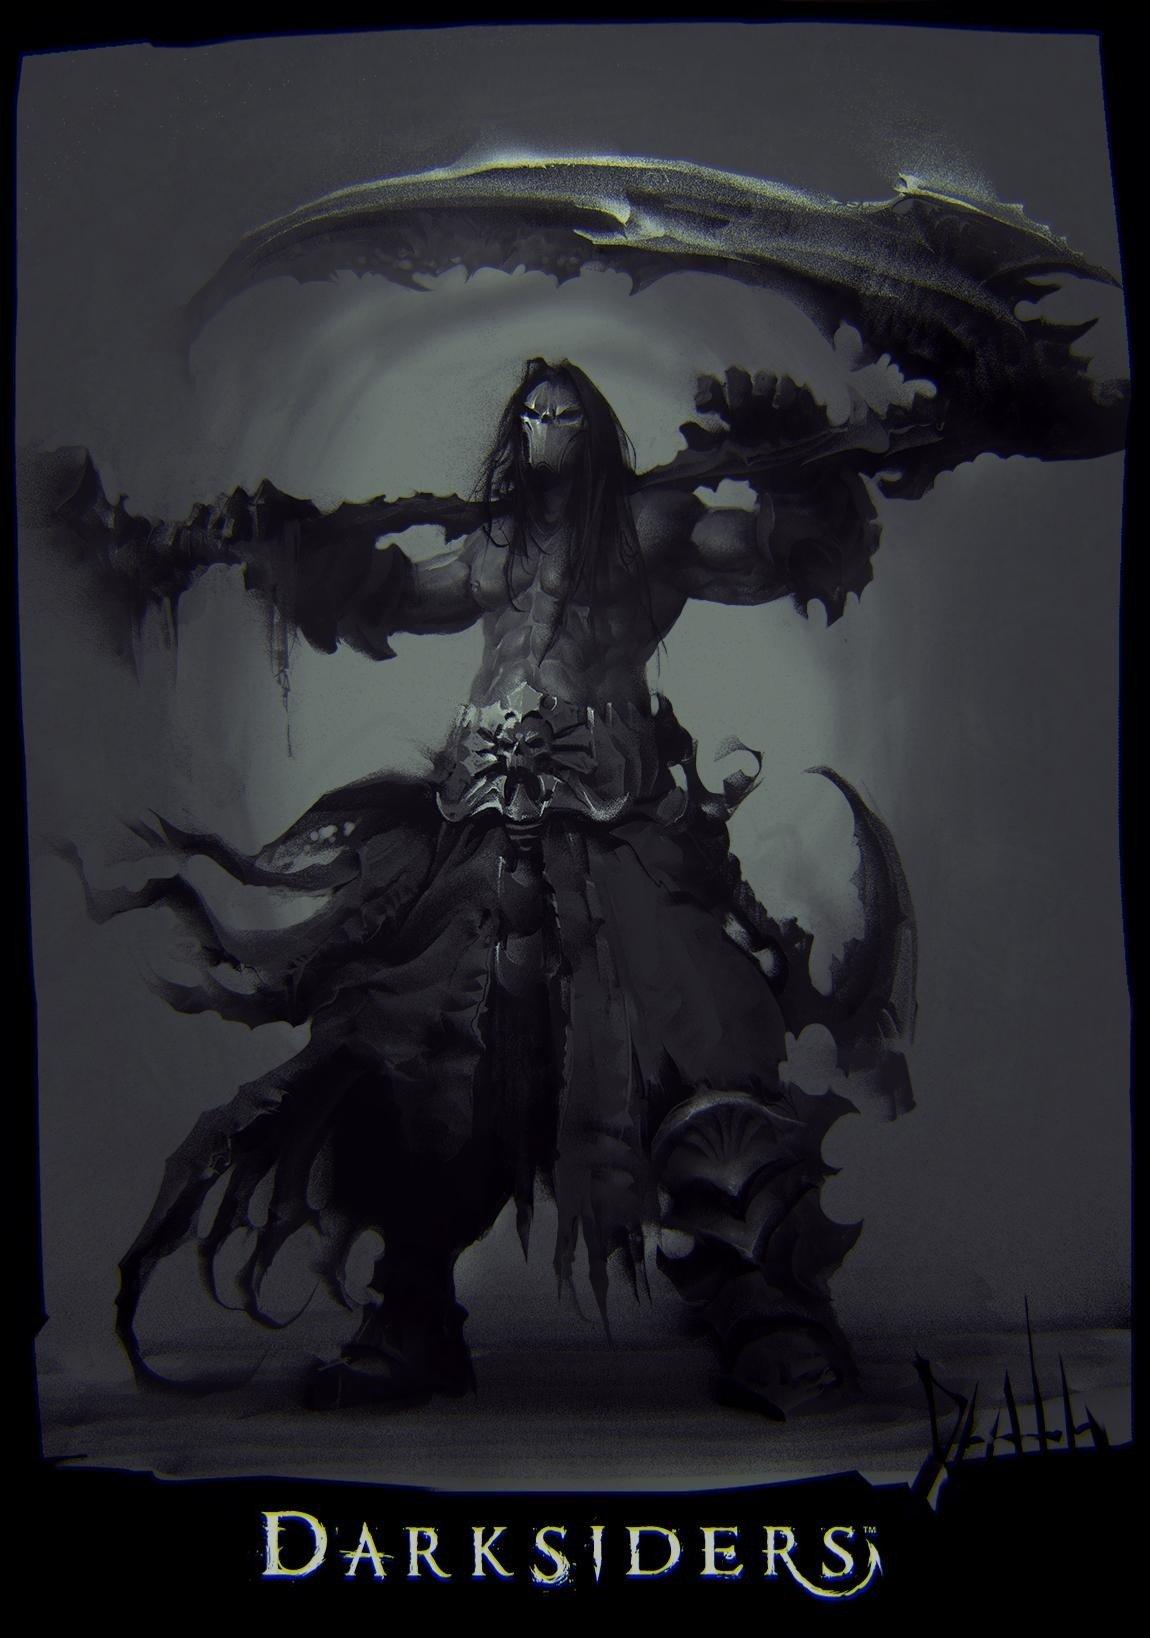 Arte 3d Wallpaper Price Darksiders War Death Four Horsemen Of The Apocalypse